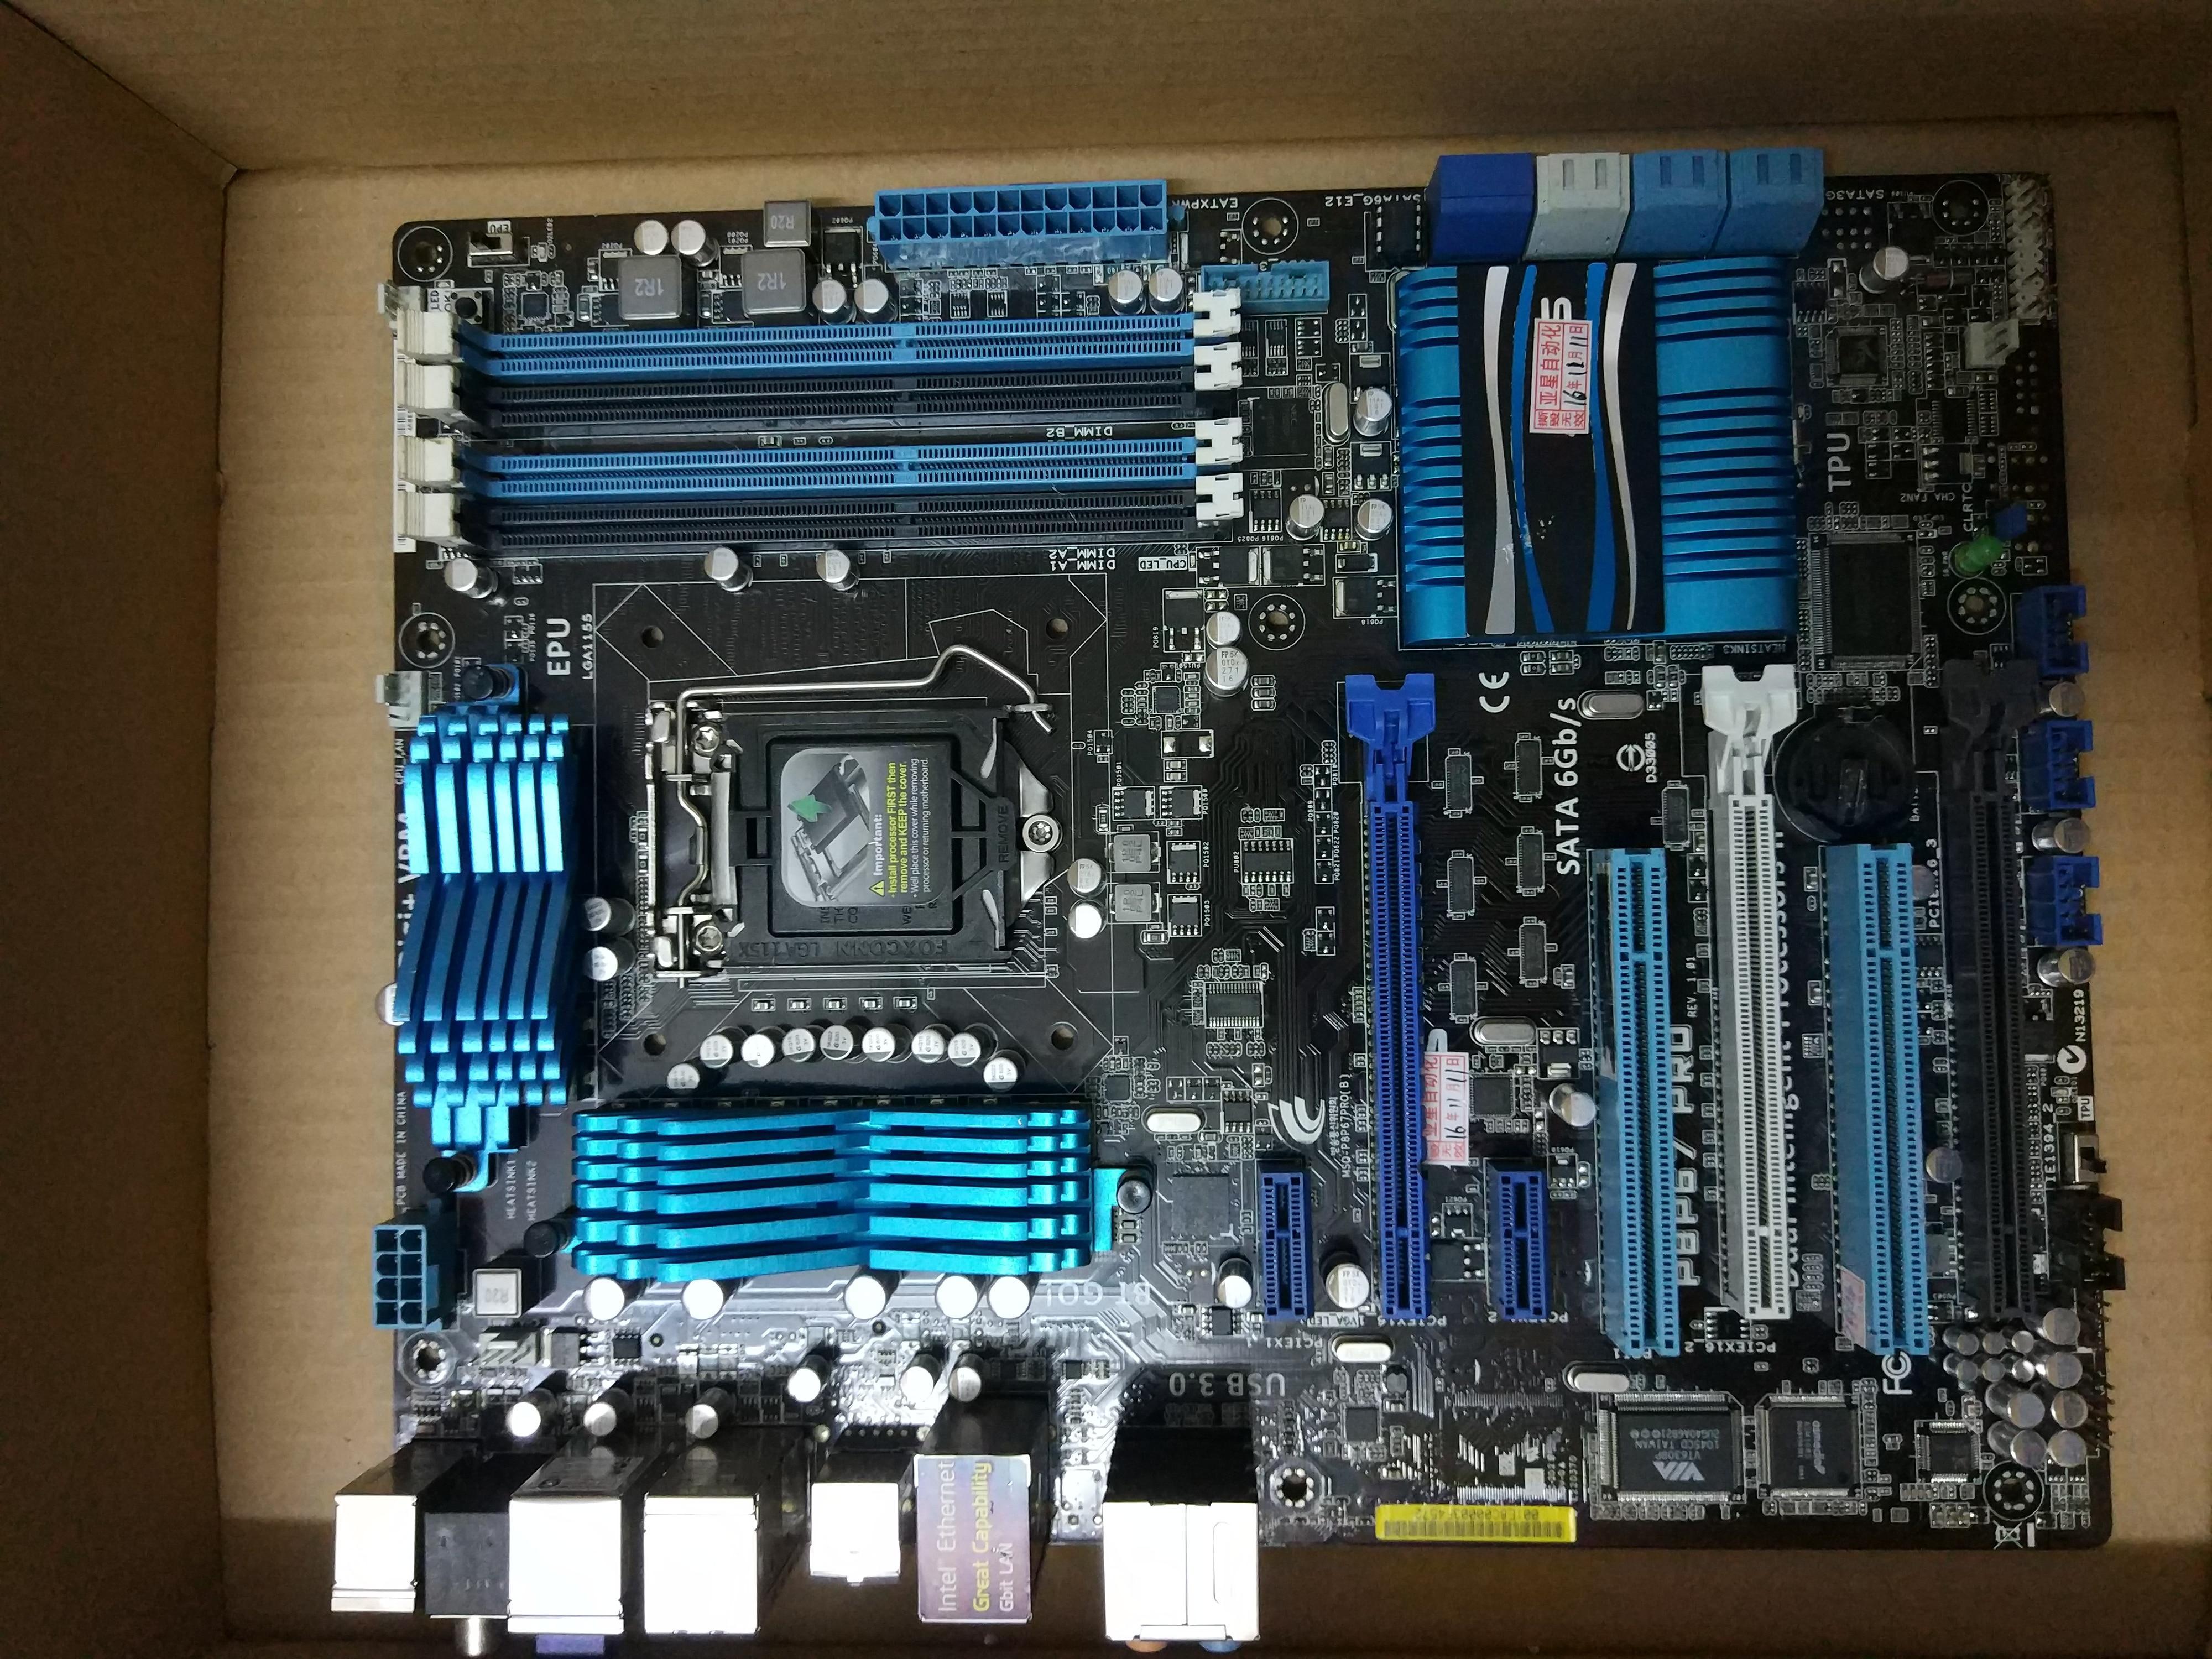 original motherboard for P8P67 PRO 3.1  LGA 1155 DDR3 boards 32GB USB3.0 SATAIII P67 Fineness new msi original zh77a g43 motherboard ddr3 lga 1155 for i3 i5 i7 cpu 32gb usb3 0 sata3 h77 motherboard